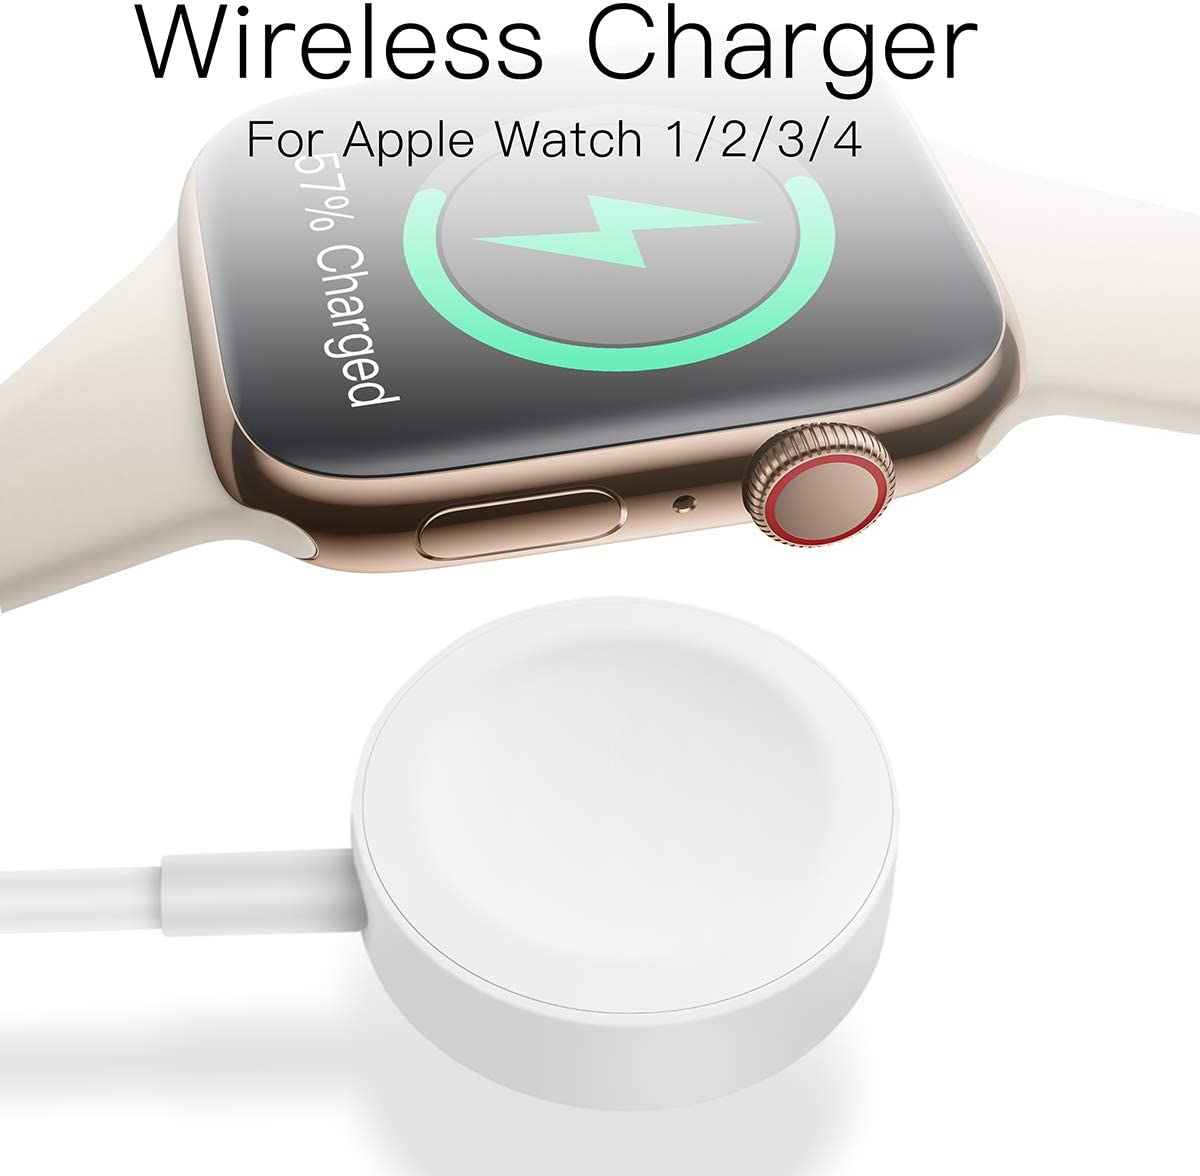 AICase iWatch Chargeur, Câble de Charge magnétique pour Apple WatchiWatch 38mm 40mm 42mm 44mmApple Watch Series 1,2,3,4. (1M)